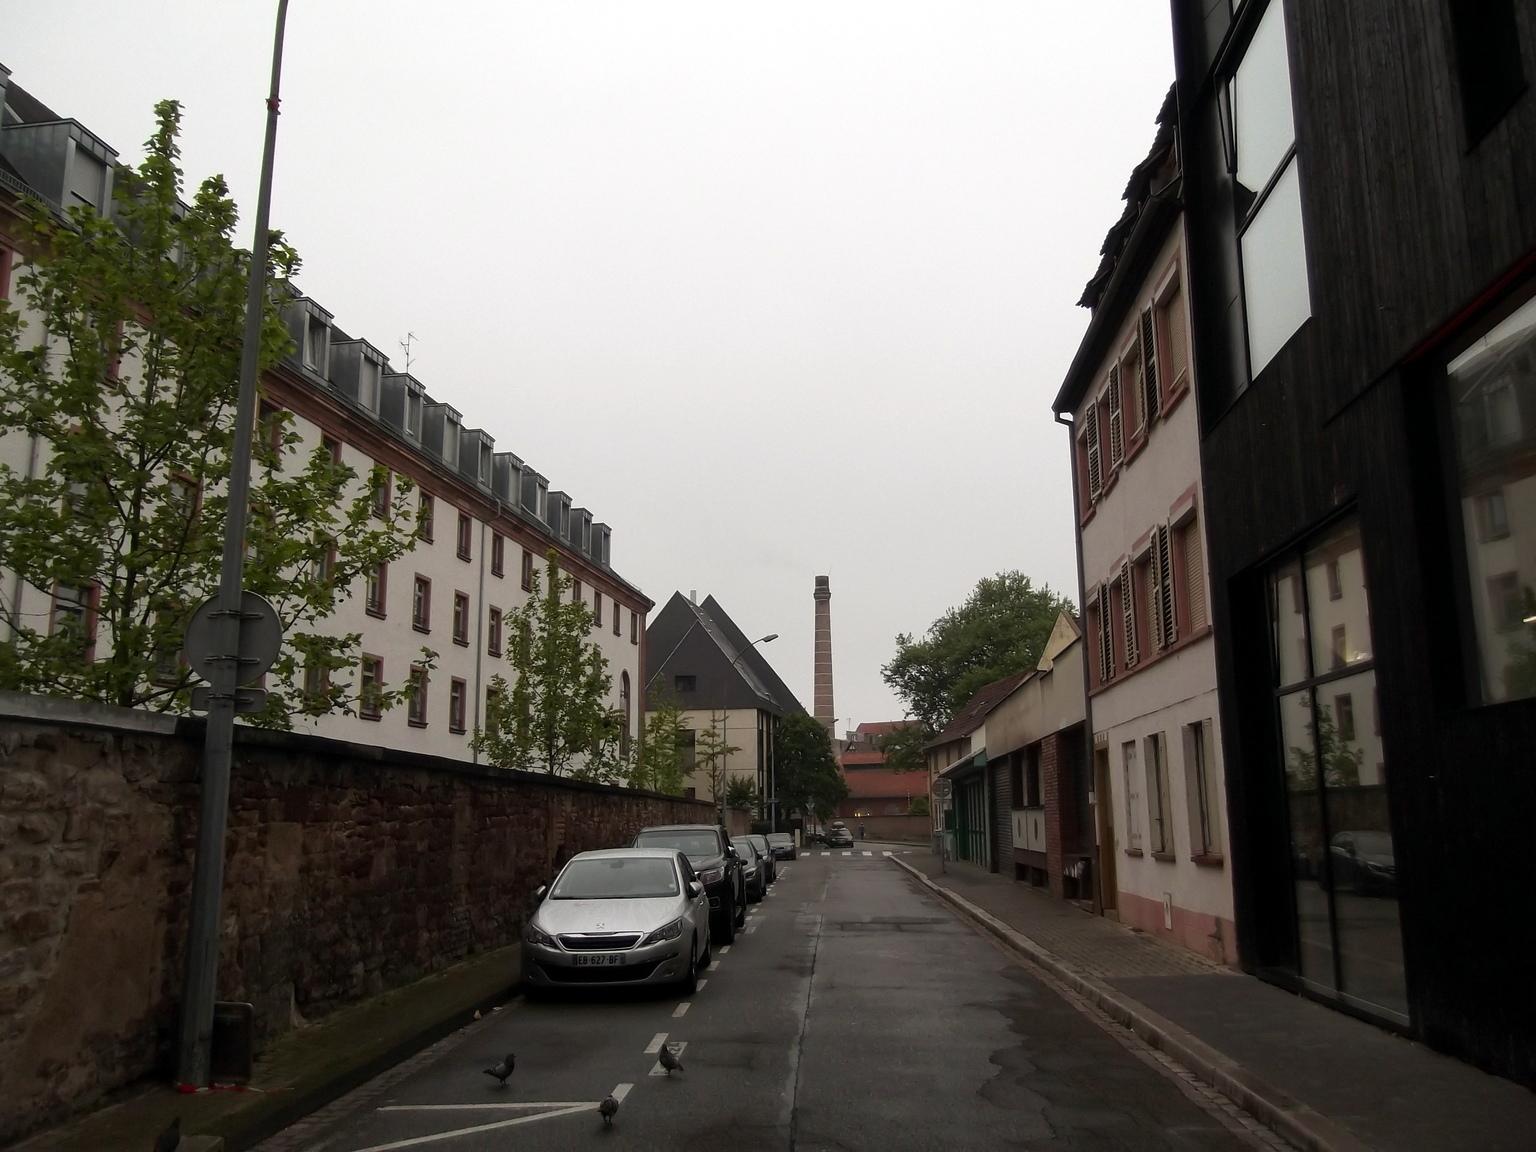 wohnstuben gestaltung : Maisons De Strasbourg R Sultats De Recherche